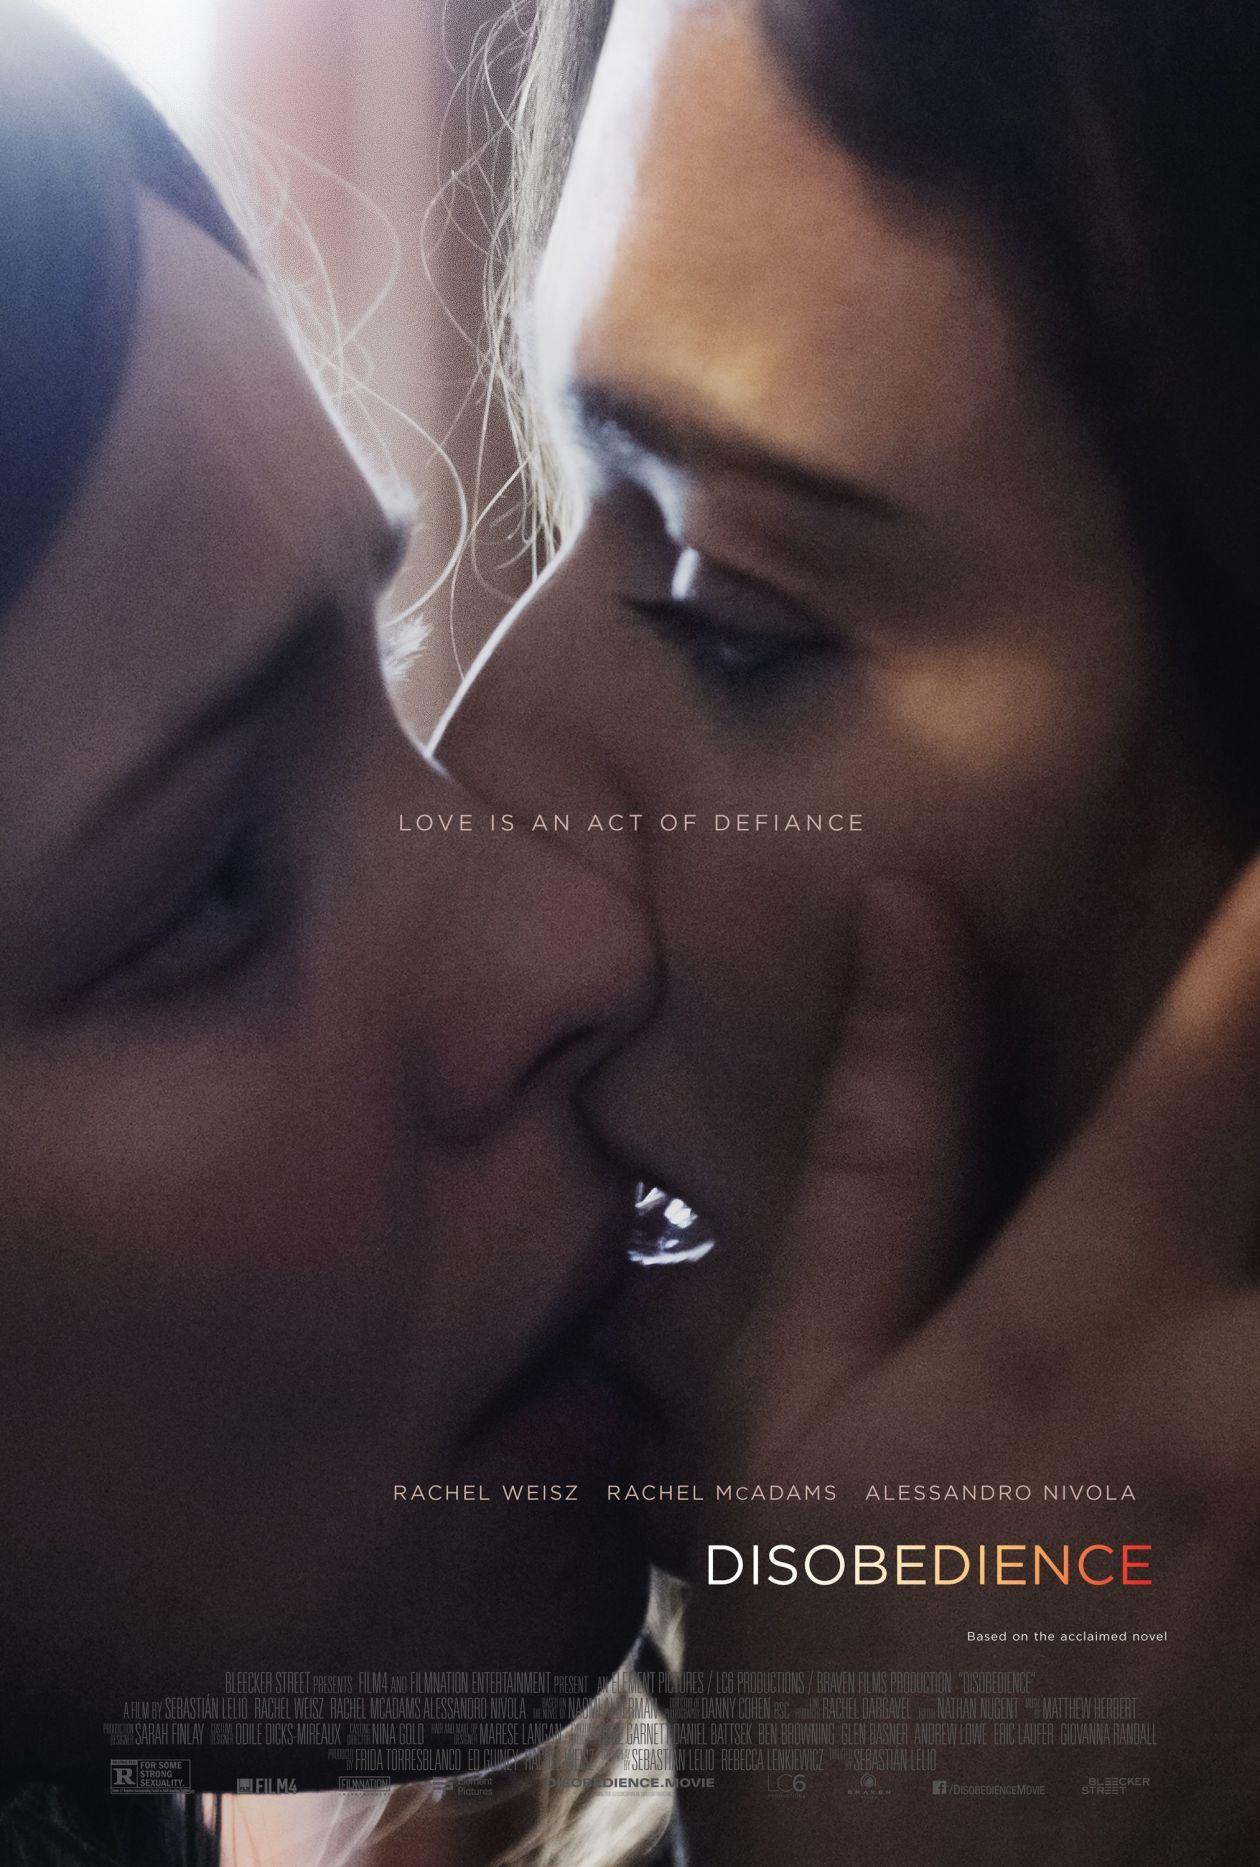 Rachel Weisz / Rachel McAdams | Disobedience / Désobéissance Movie Poster / Affiche film